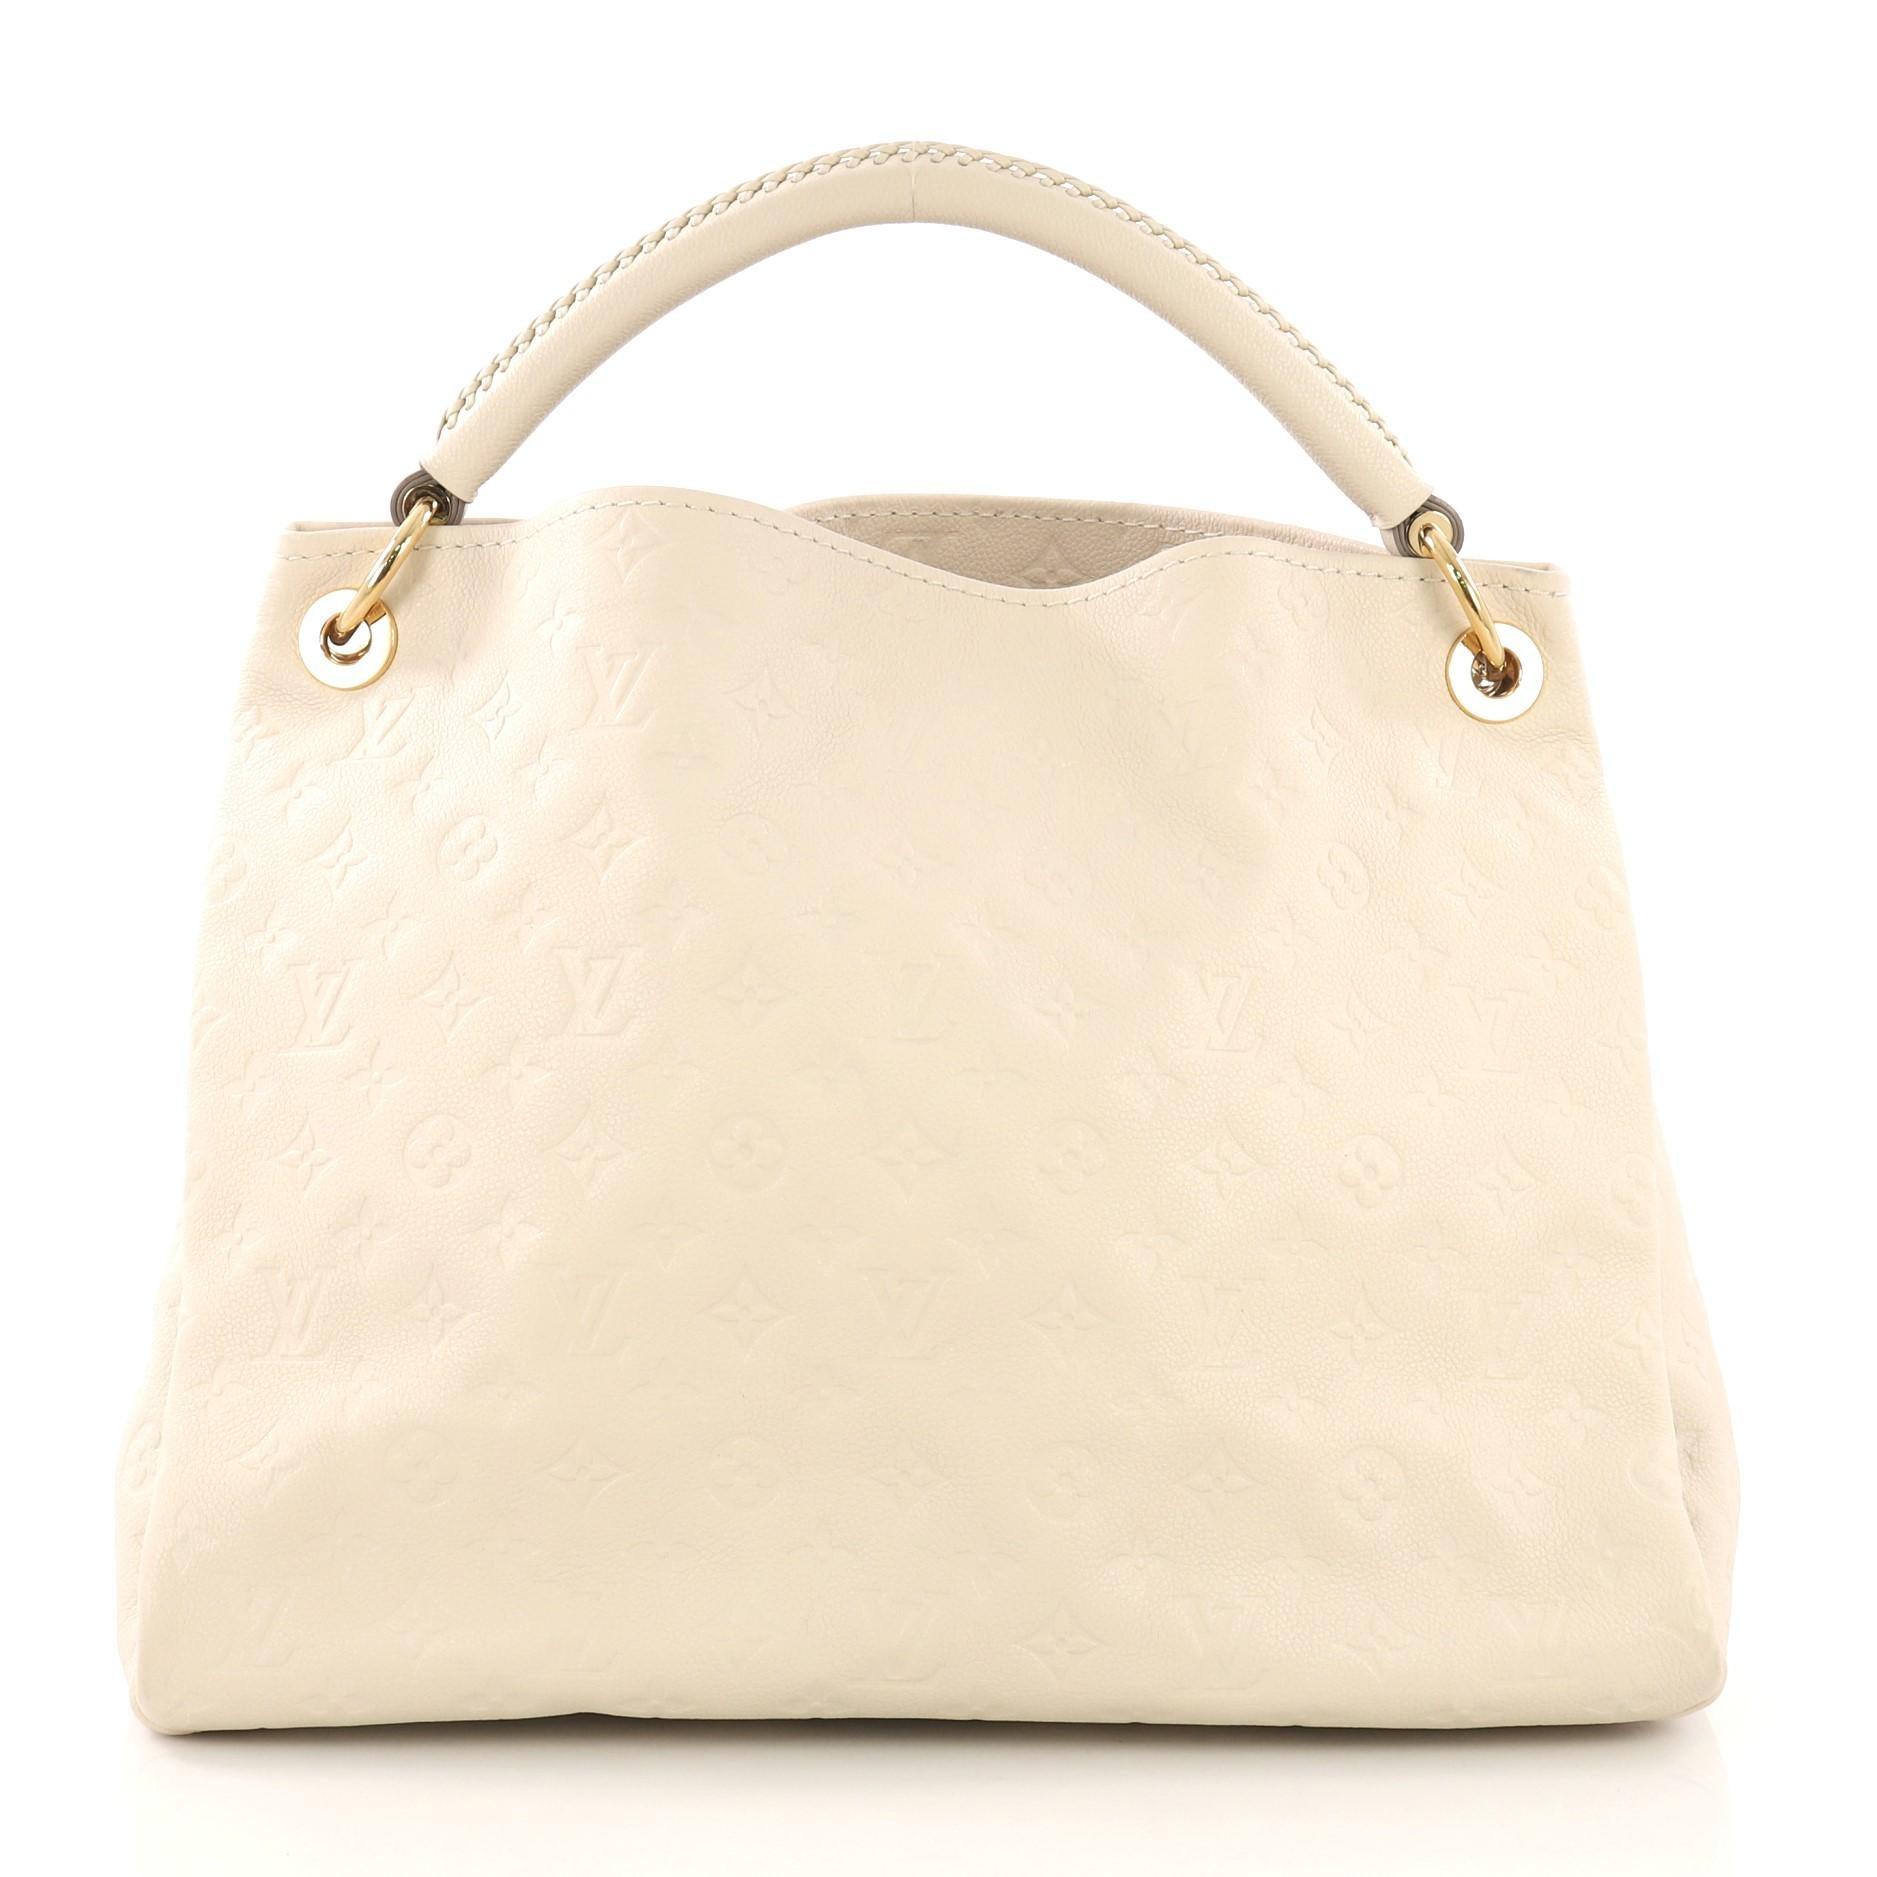 5da985807629 Louis Vuitton Artsy Handbag Monogram Empreinte Leather MM For Sale at  1stdibs